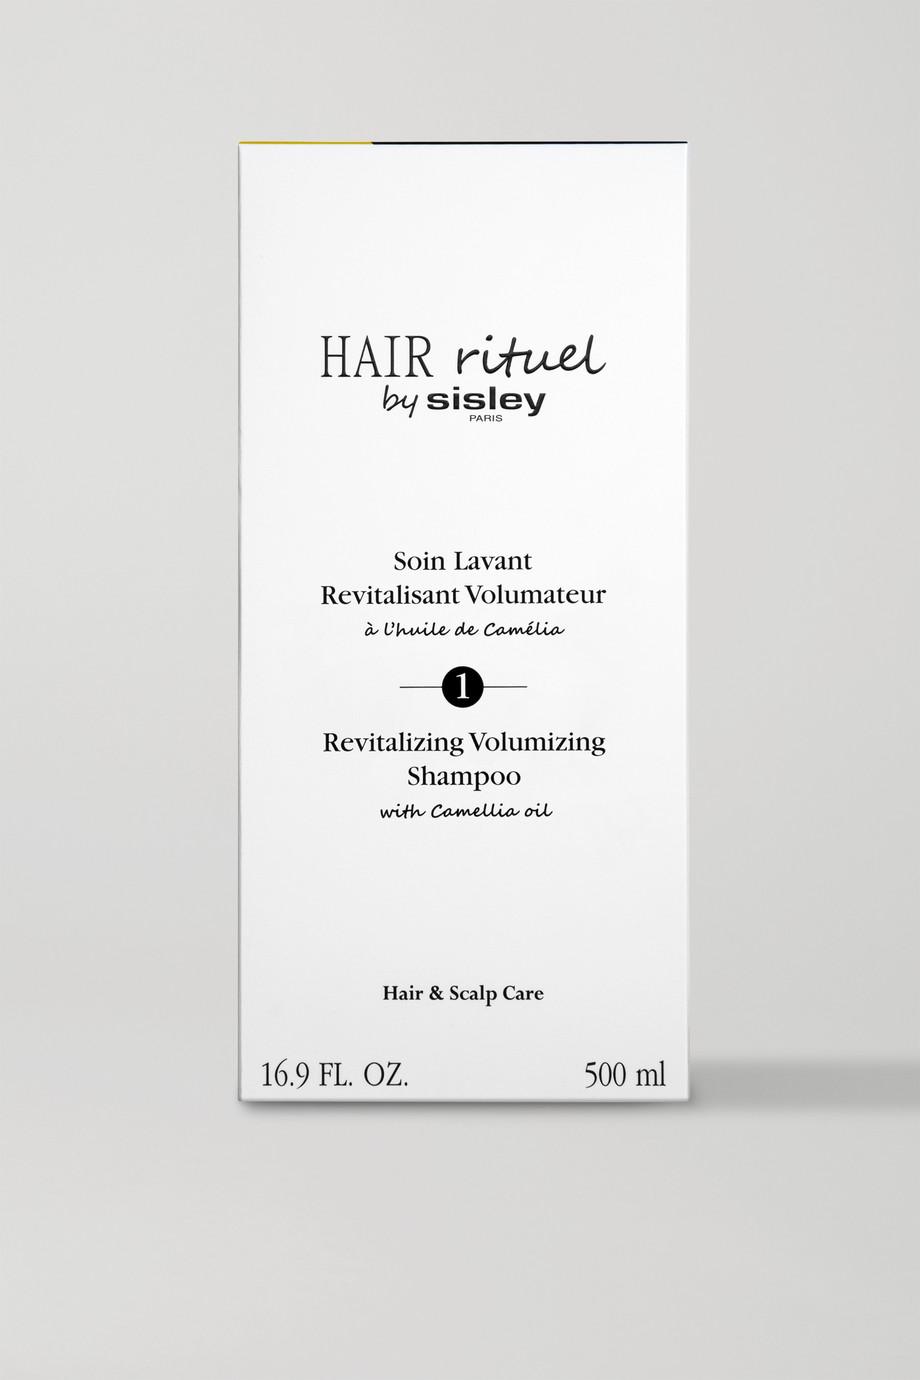 HAIR rituel by Sisley Revitalizing Volumizing Shampoo, 500ml